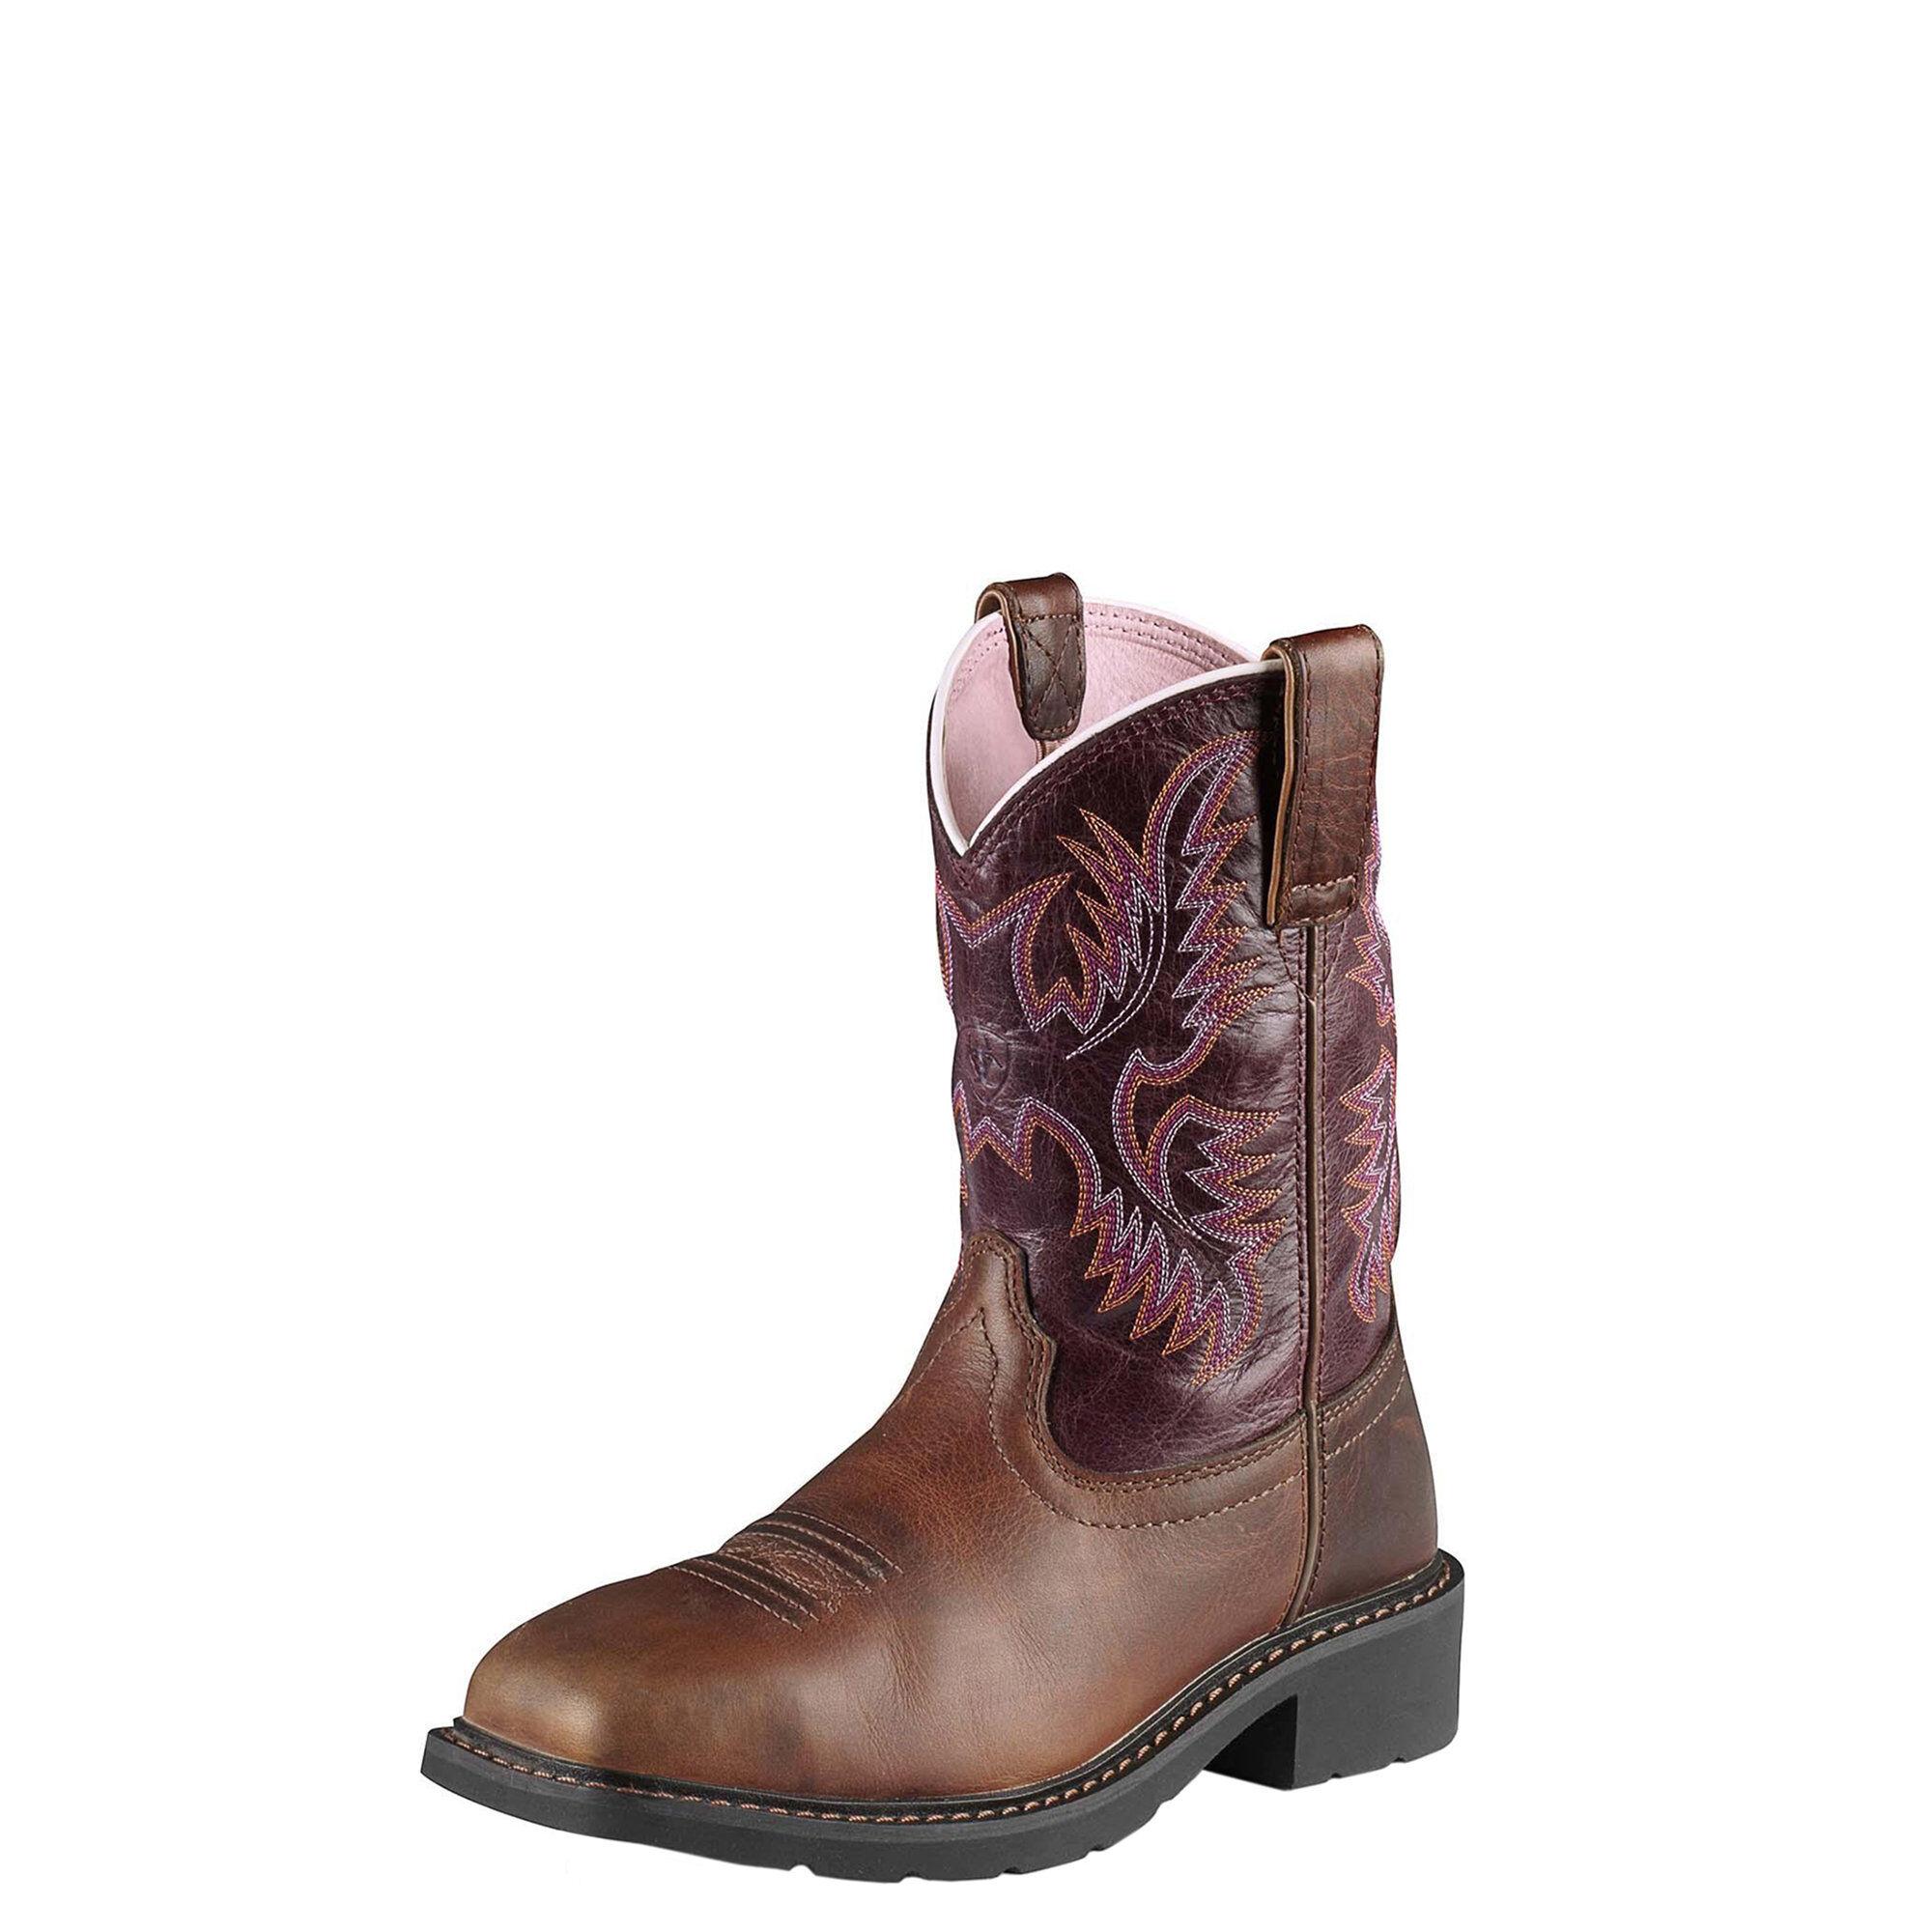 Women's Krista Steel Toe Work Boots in Dark Tan Leather by Ariat